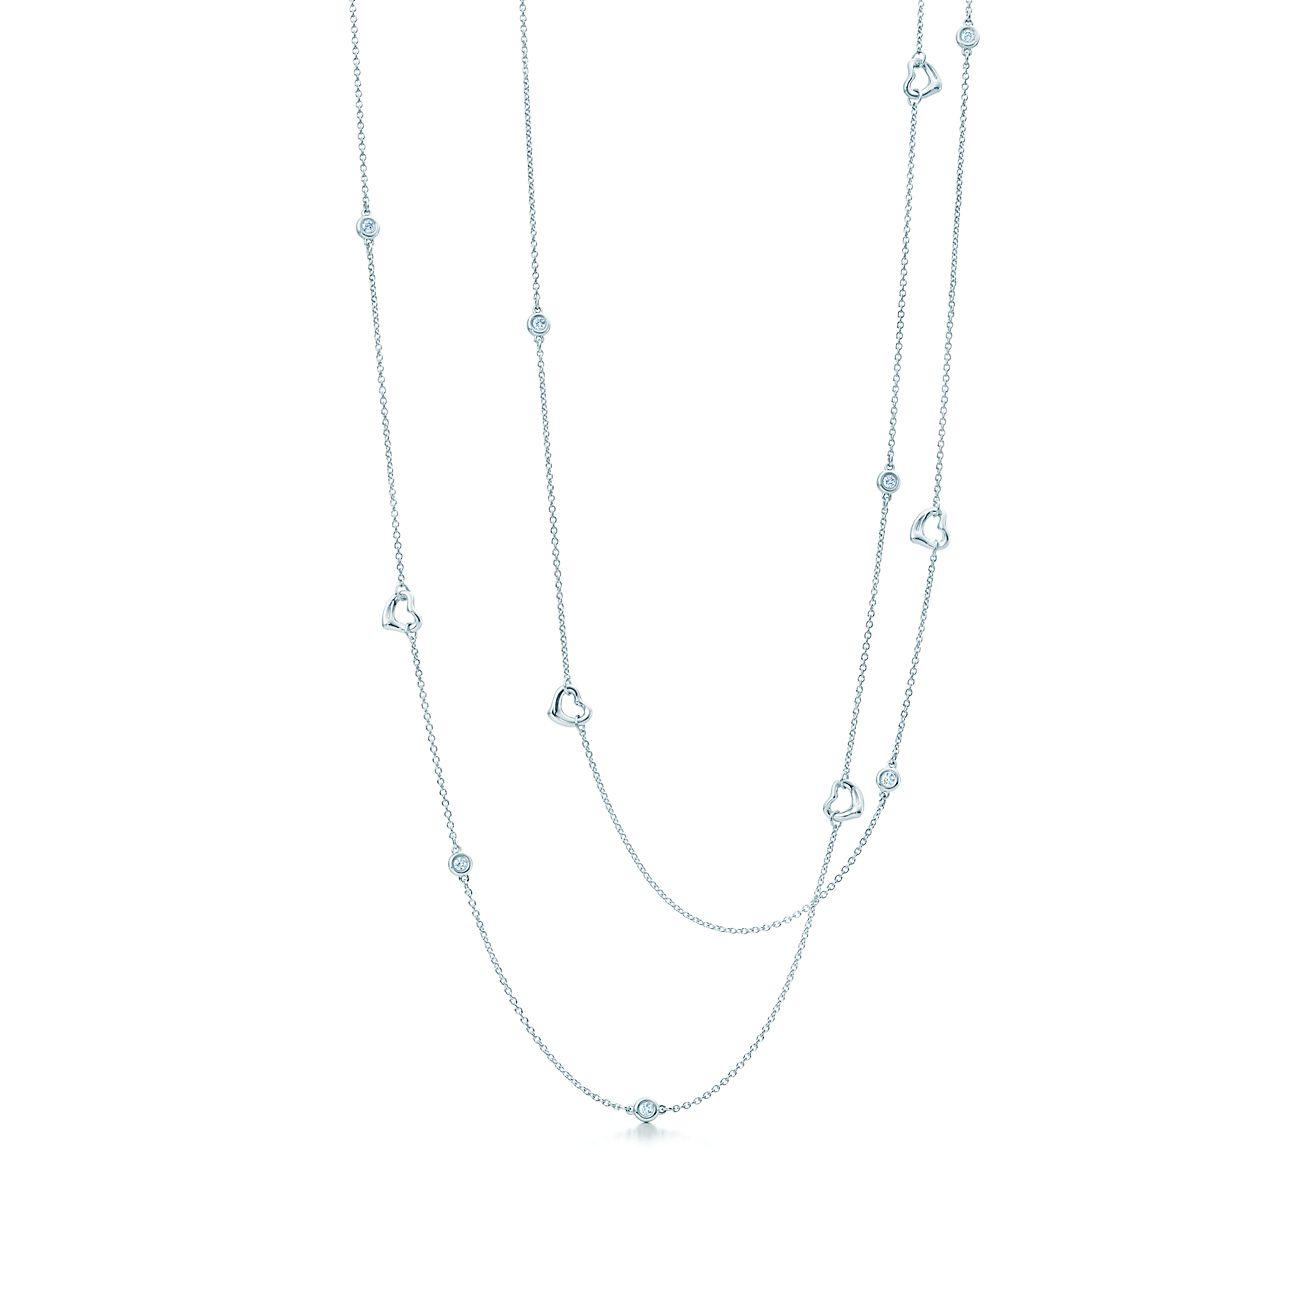 Elsa Peretti Diamonds By The Yard Open Heart Necklace